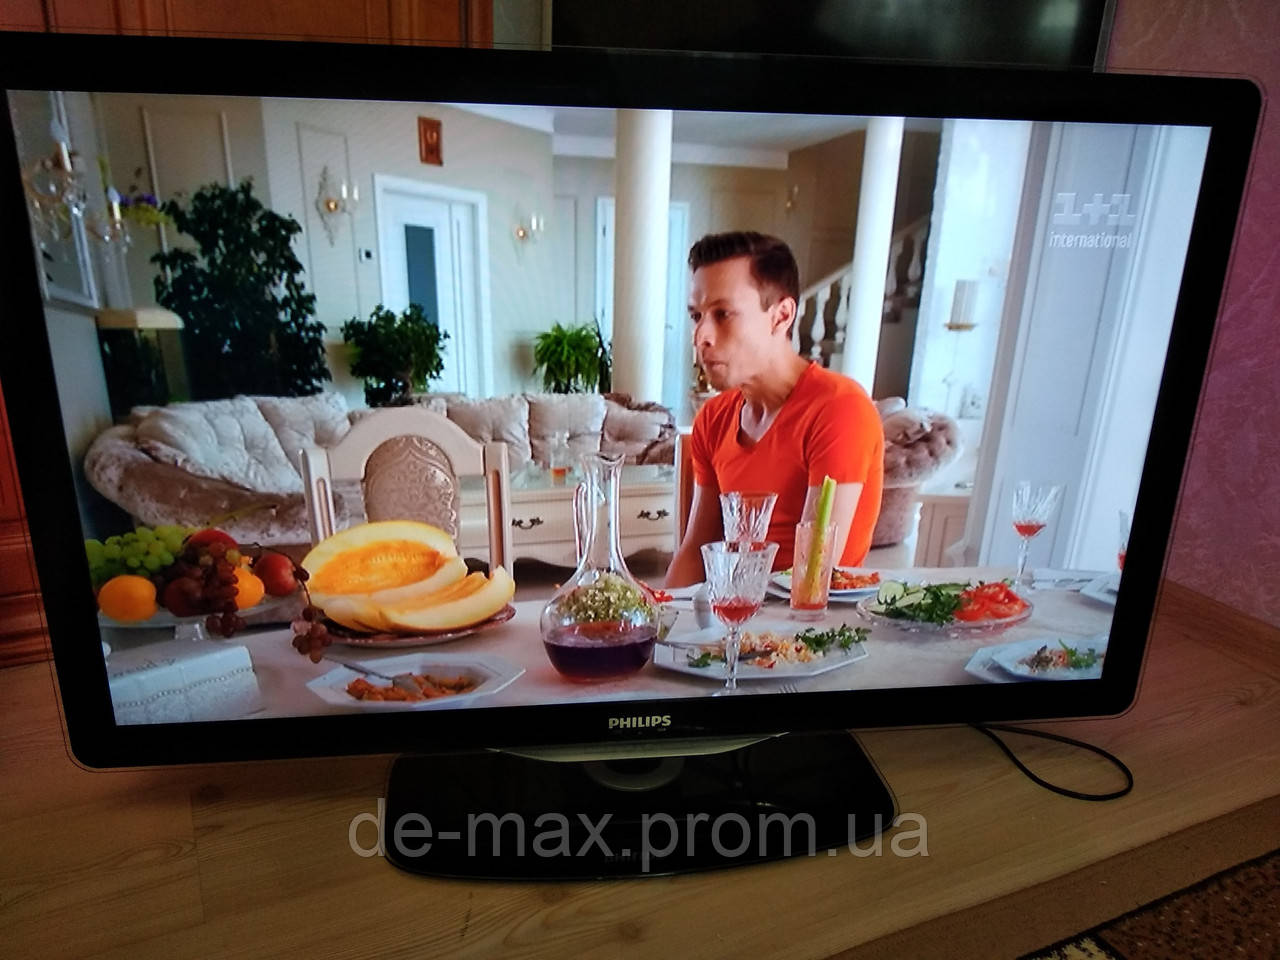 Телевизор 40 дюймов Philips 40PFL8605H Smart TV 200Гц Active 3D